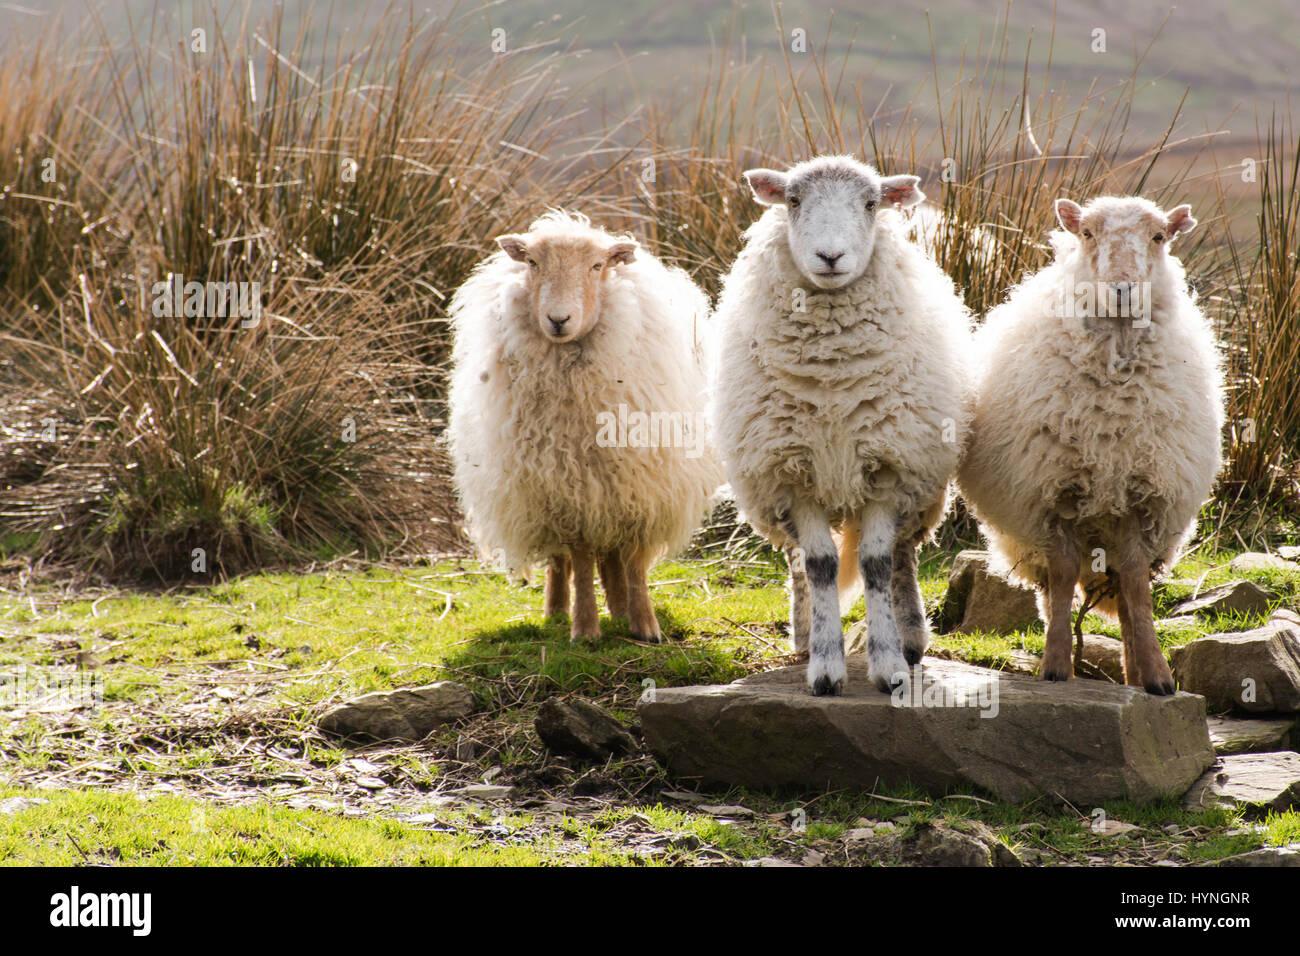 three sheep - Stock Image